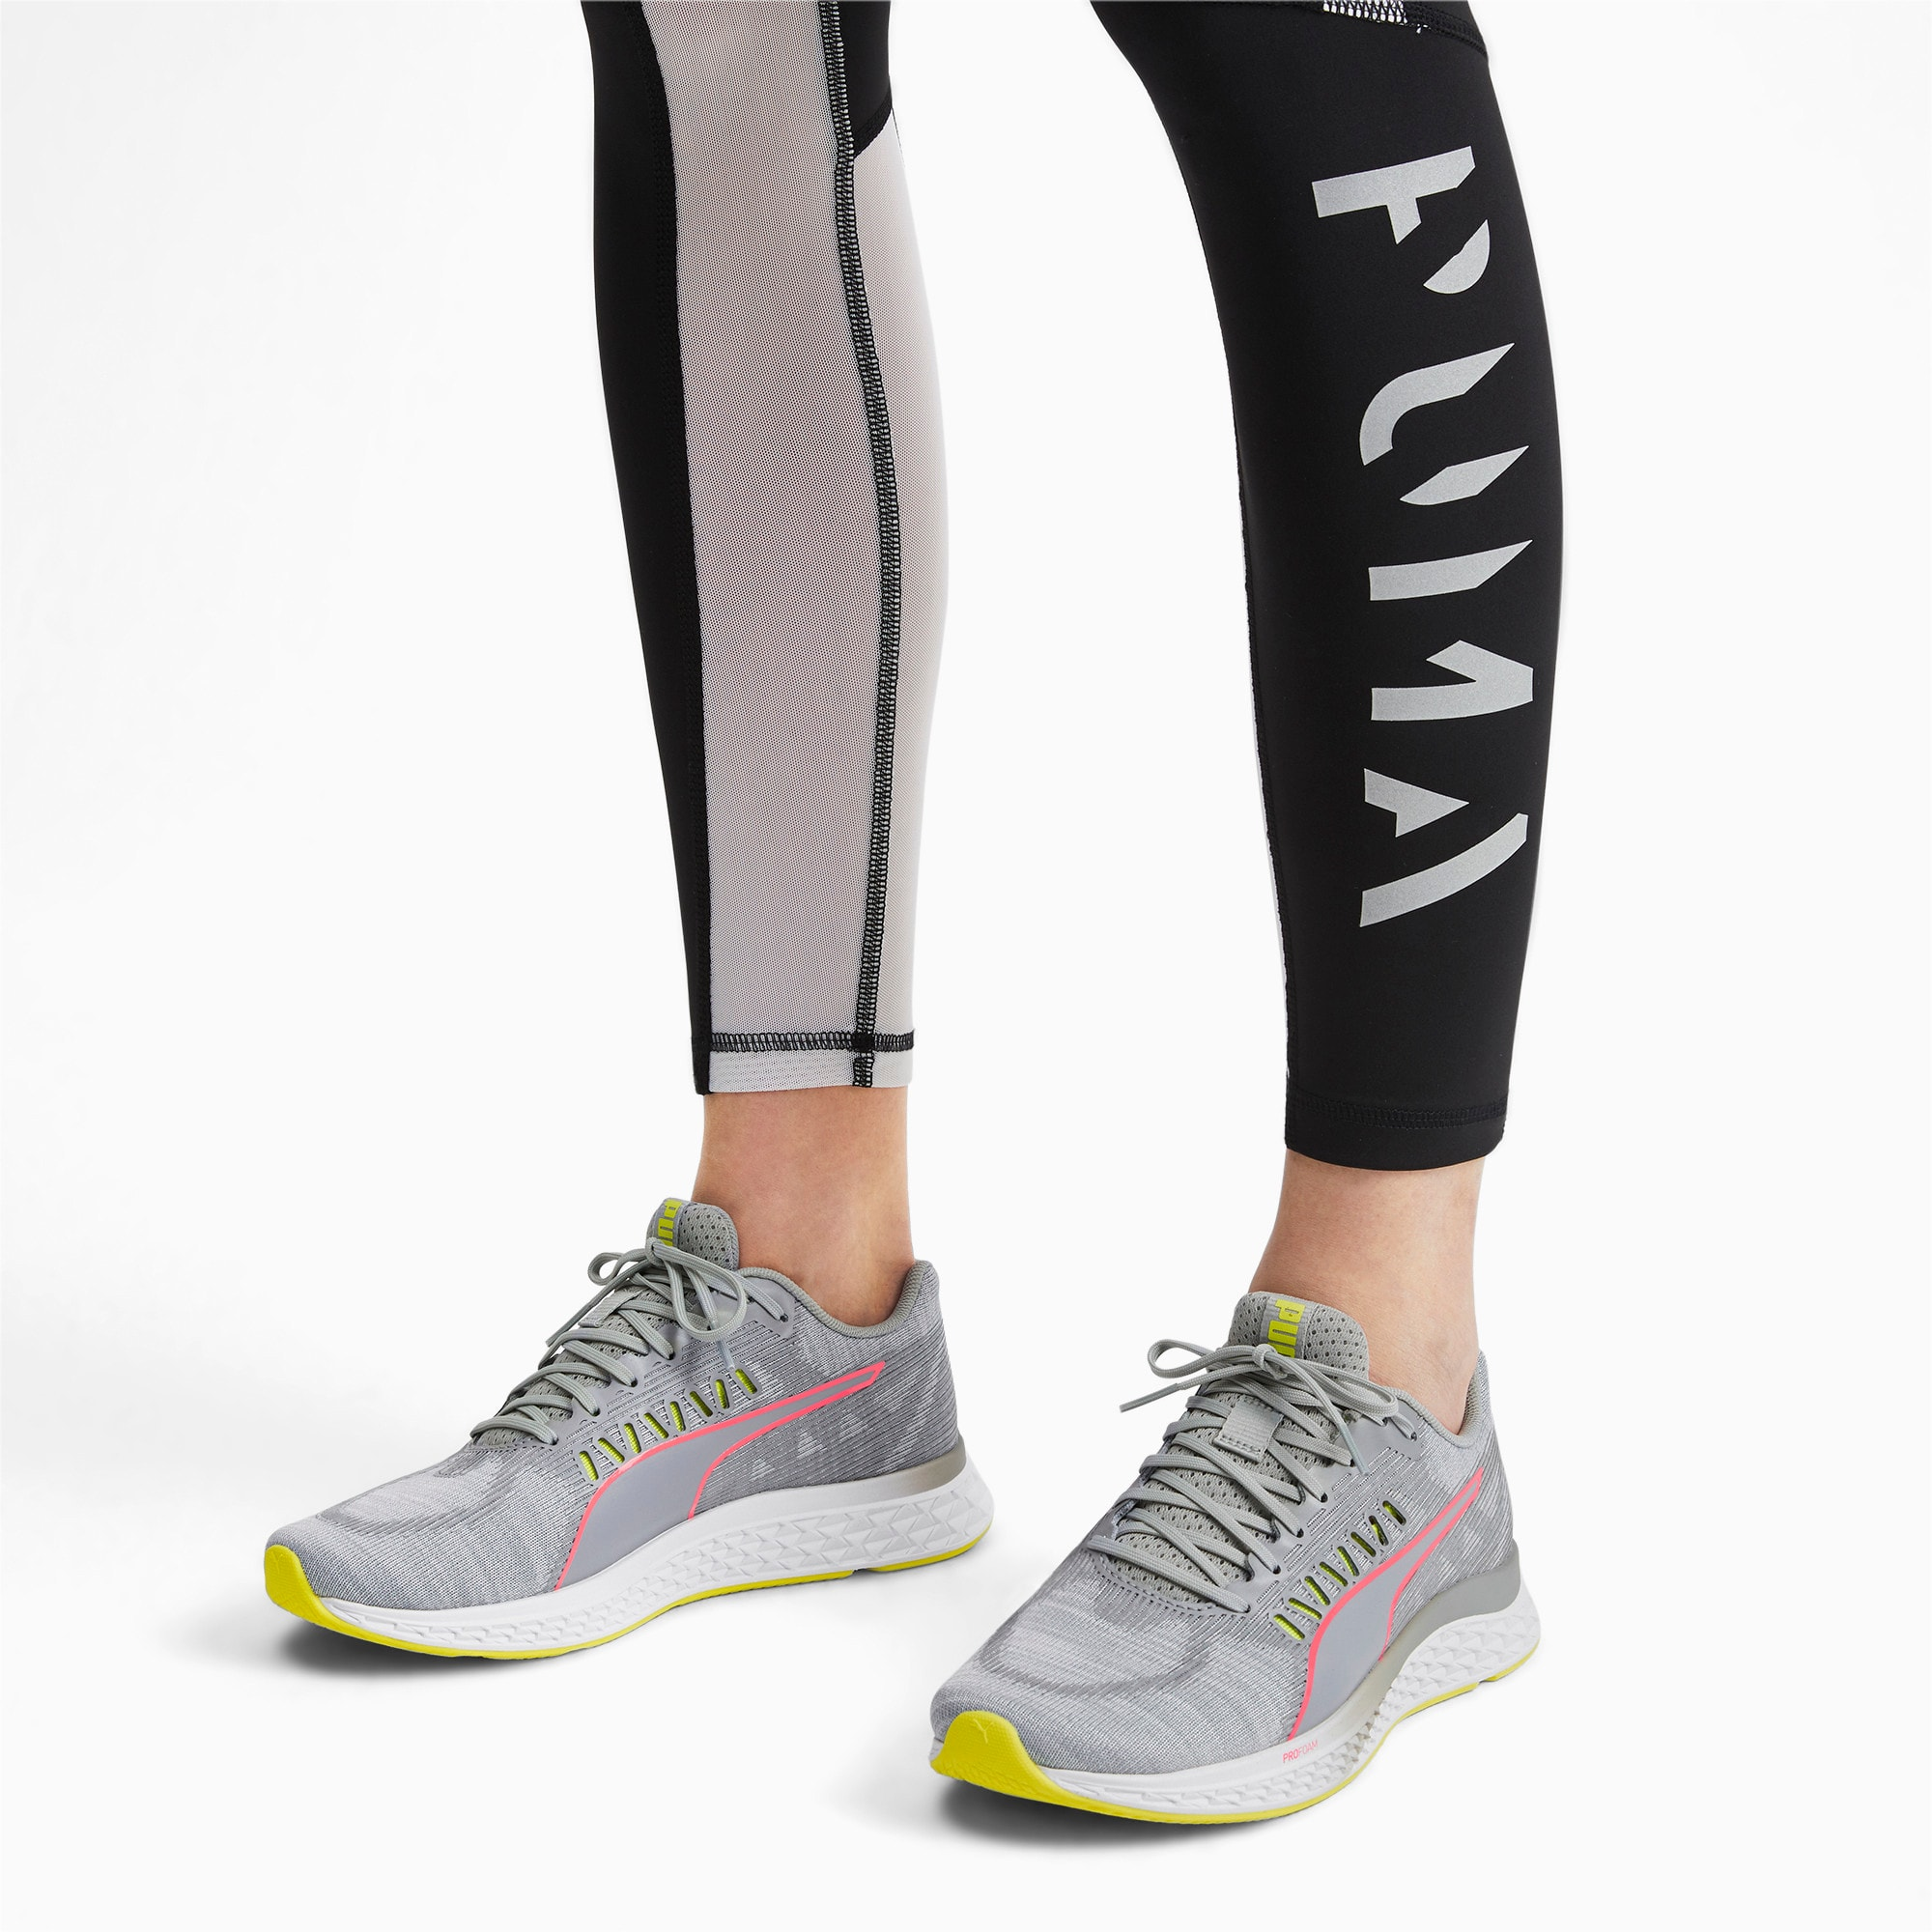 Thumbnail 3 of Speed Sutamina Women's Running Shoes, Quarry-Yellow Alert-Pink, medium-IND